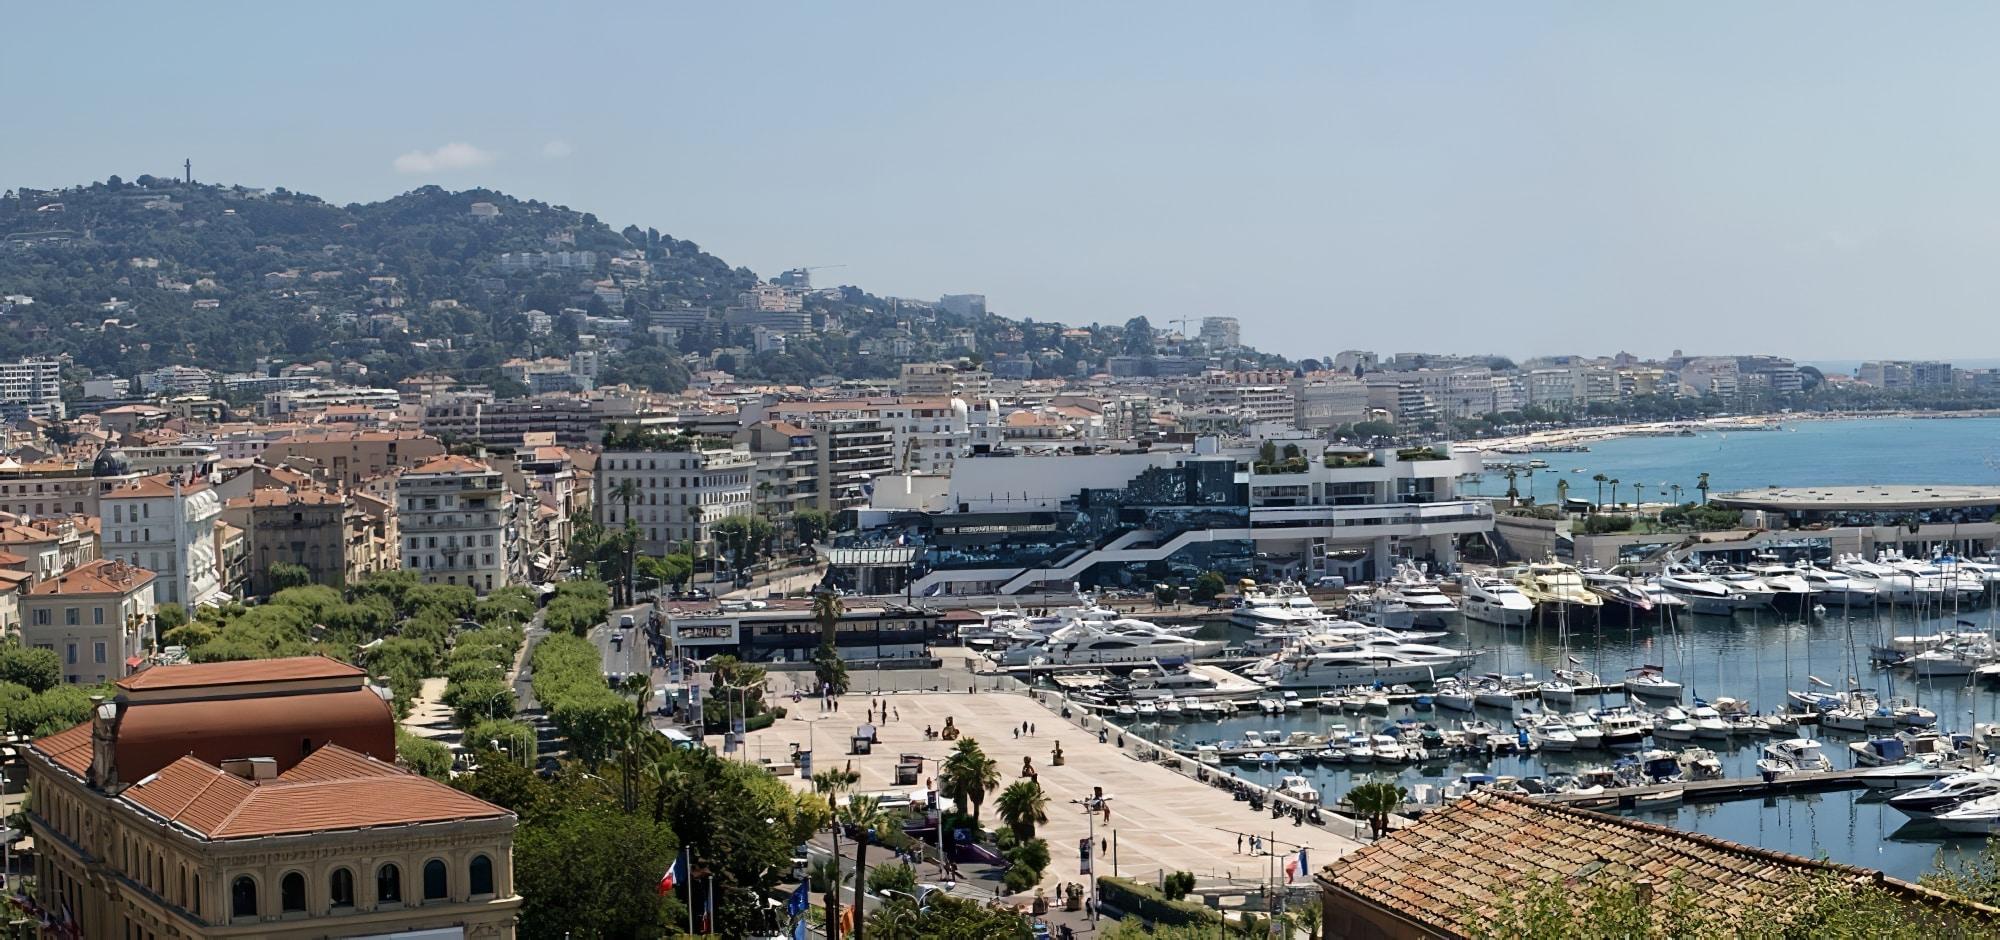 Où dormir à Cannes ?